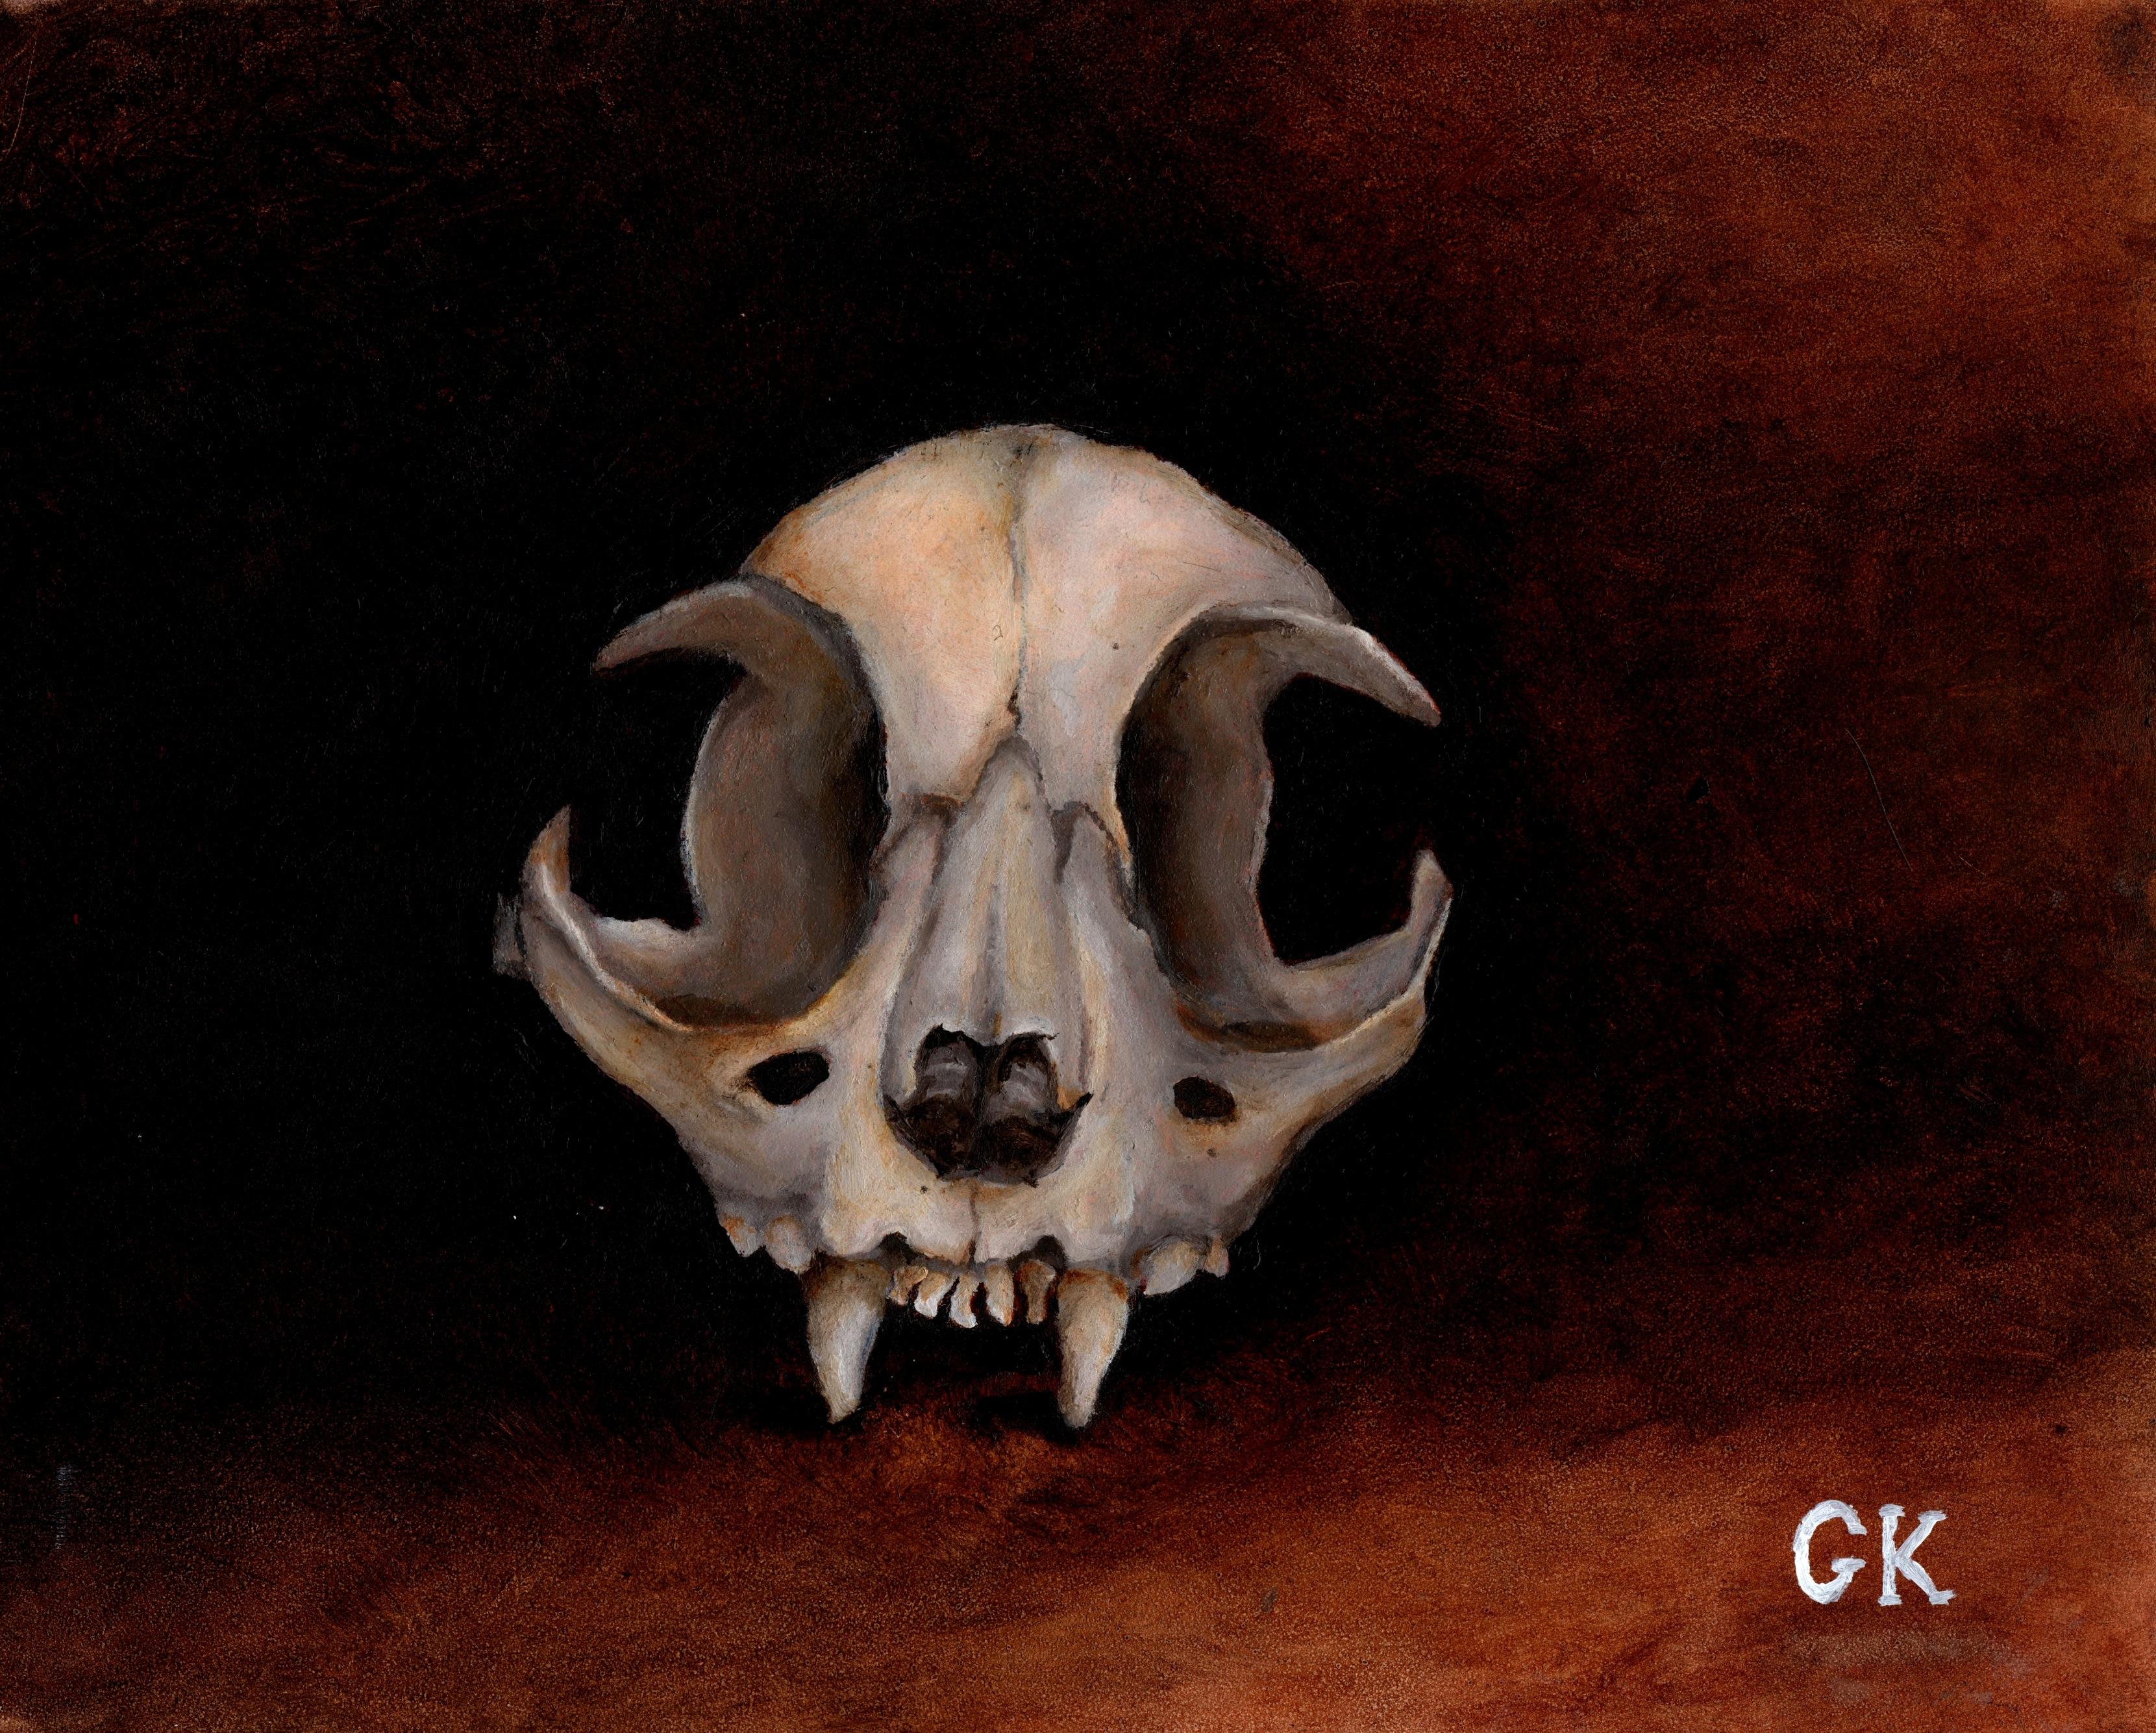 Grant Kearney Cat Skull.jpeg